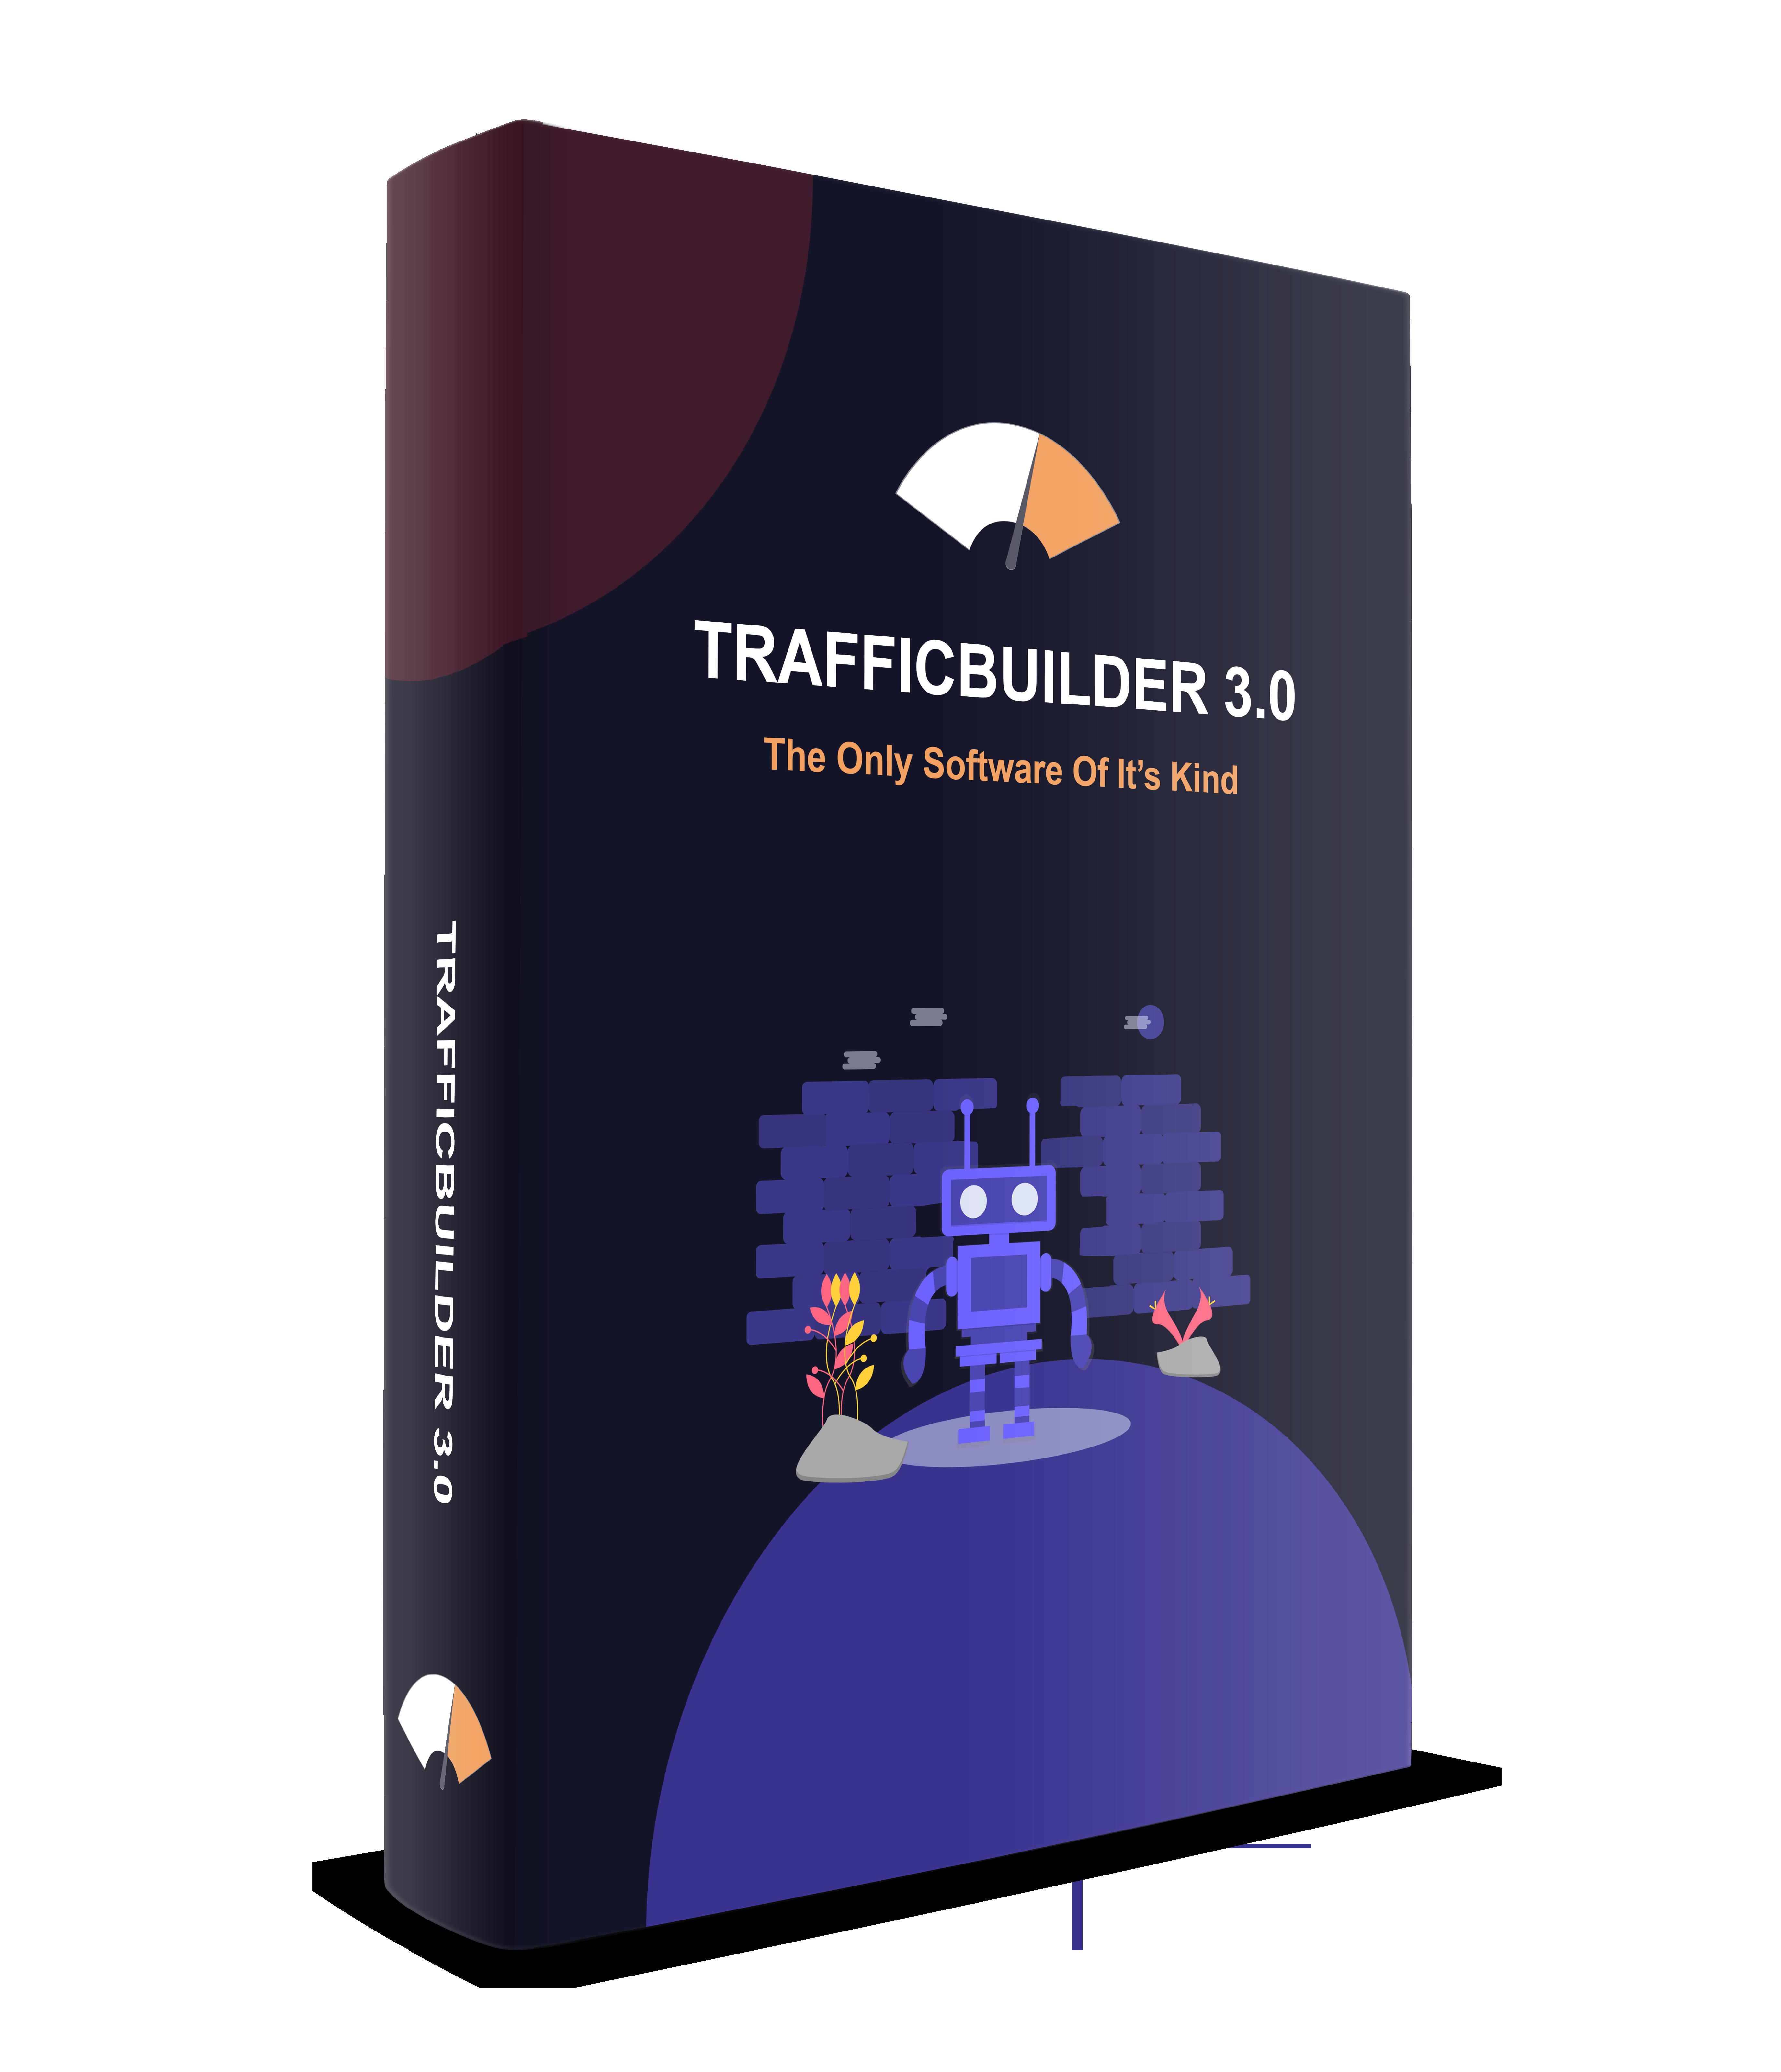 TrafficBuilder 3.0 box image